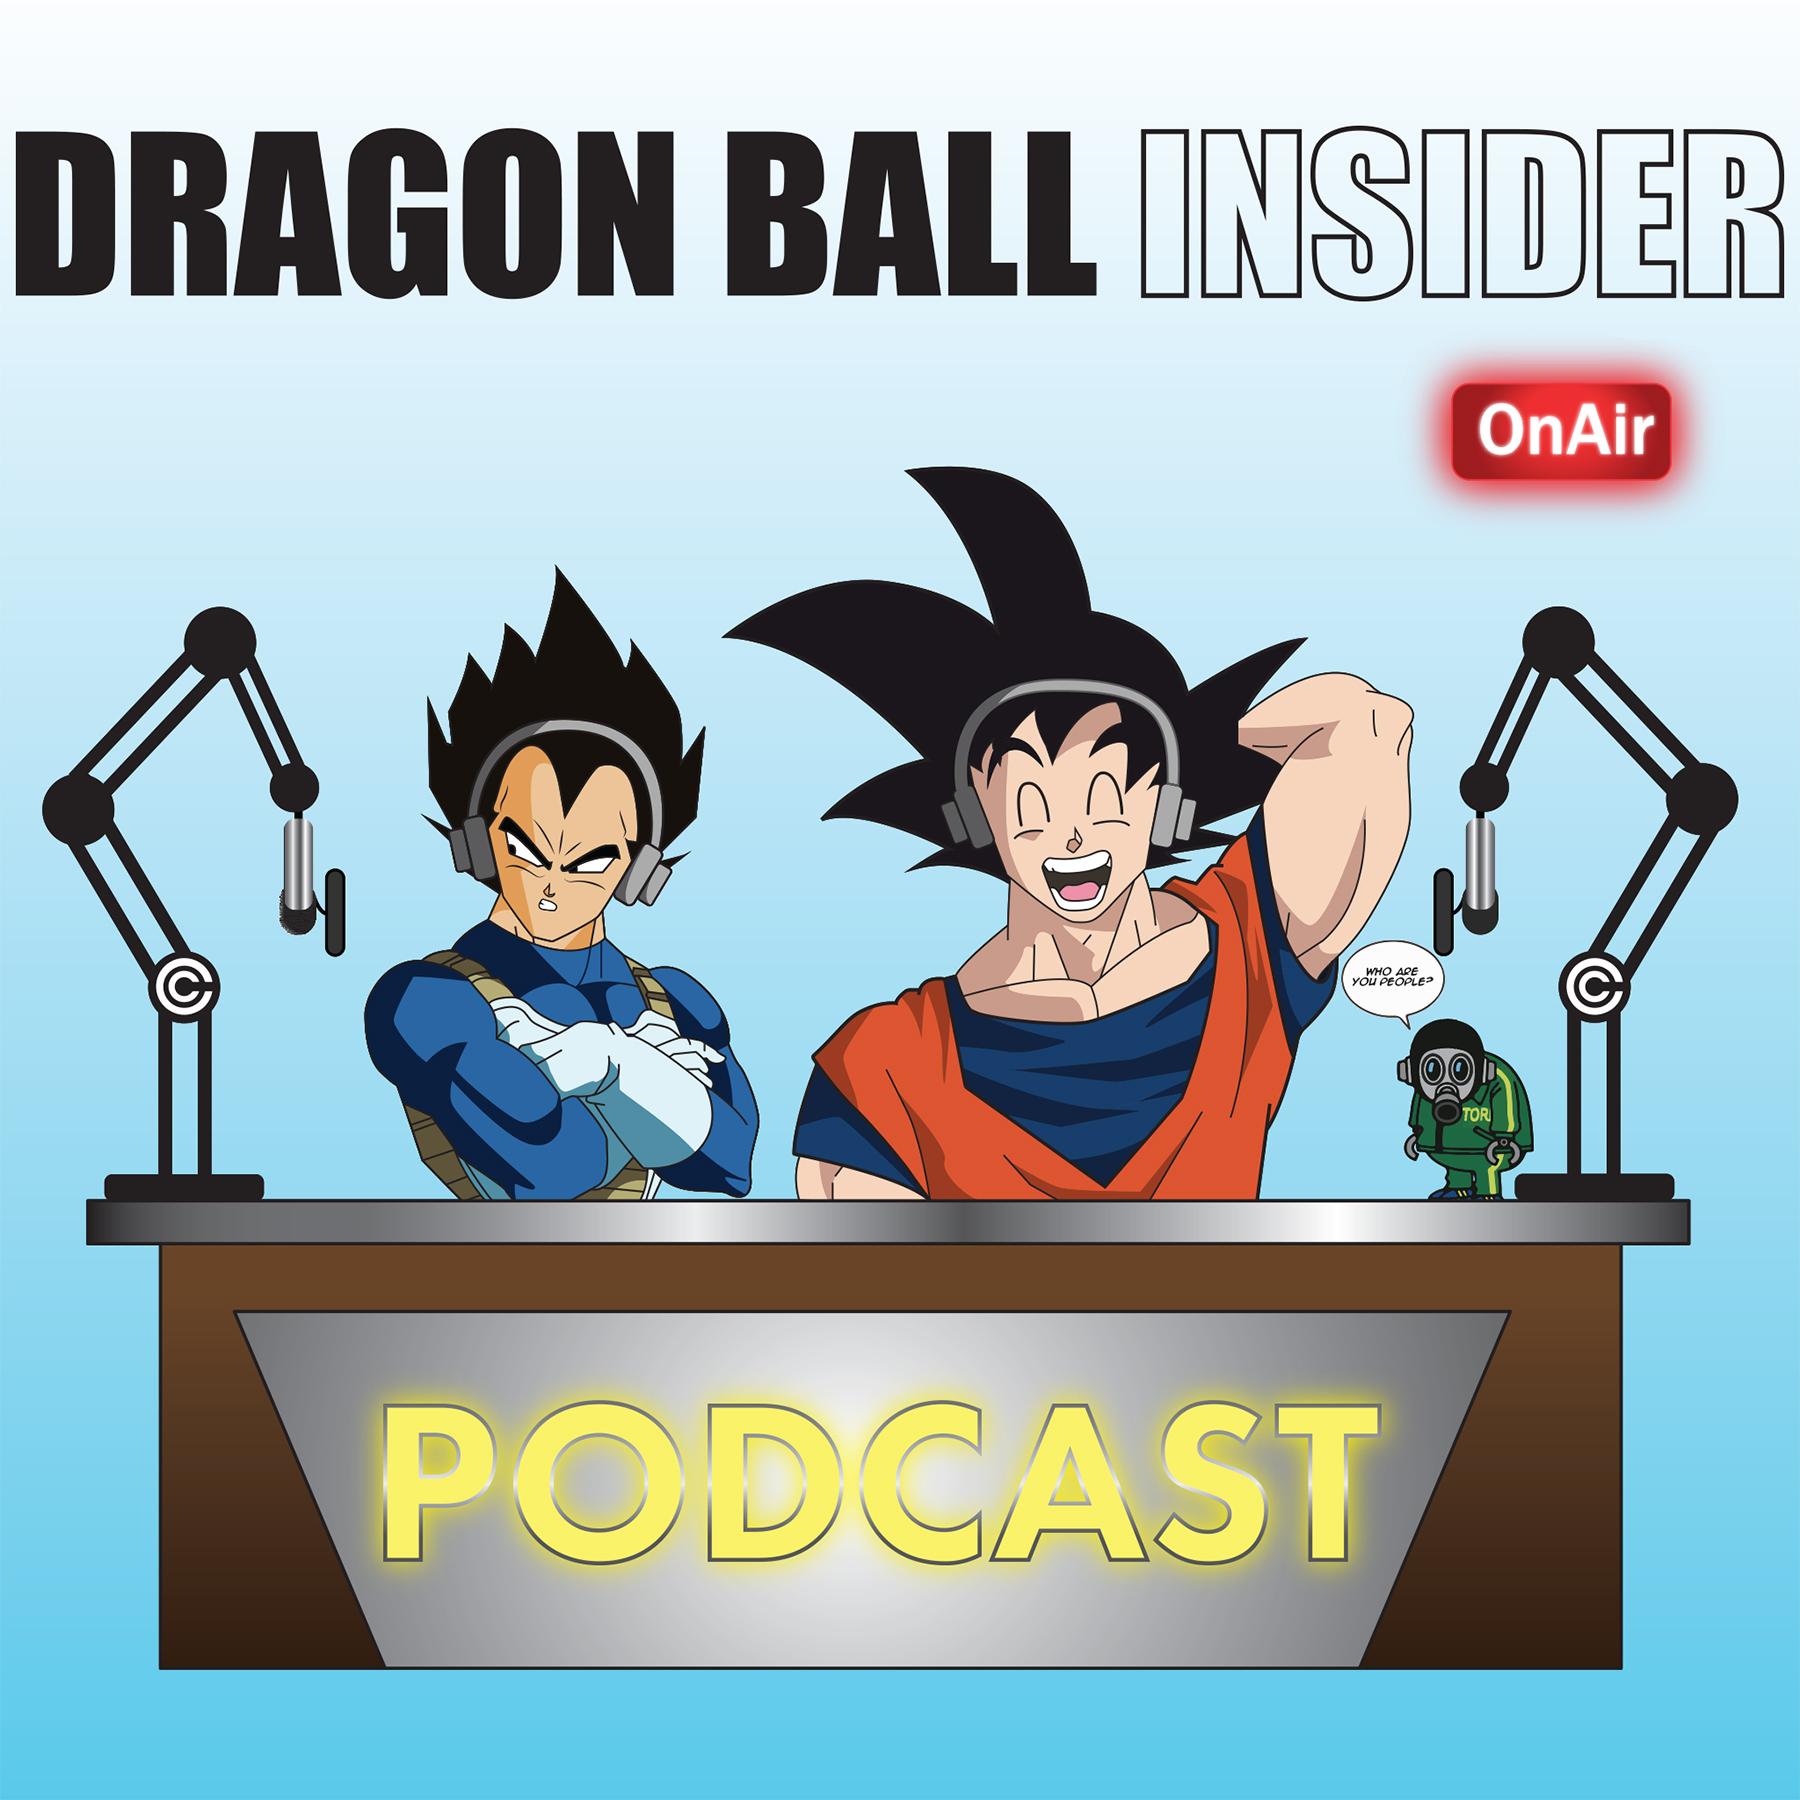 Dragon Ball Insider - Podcast